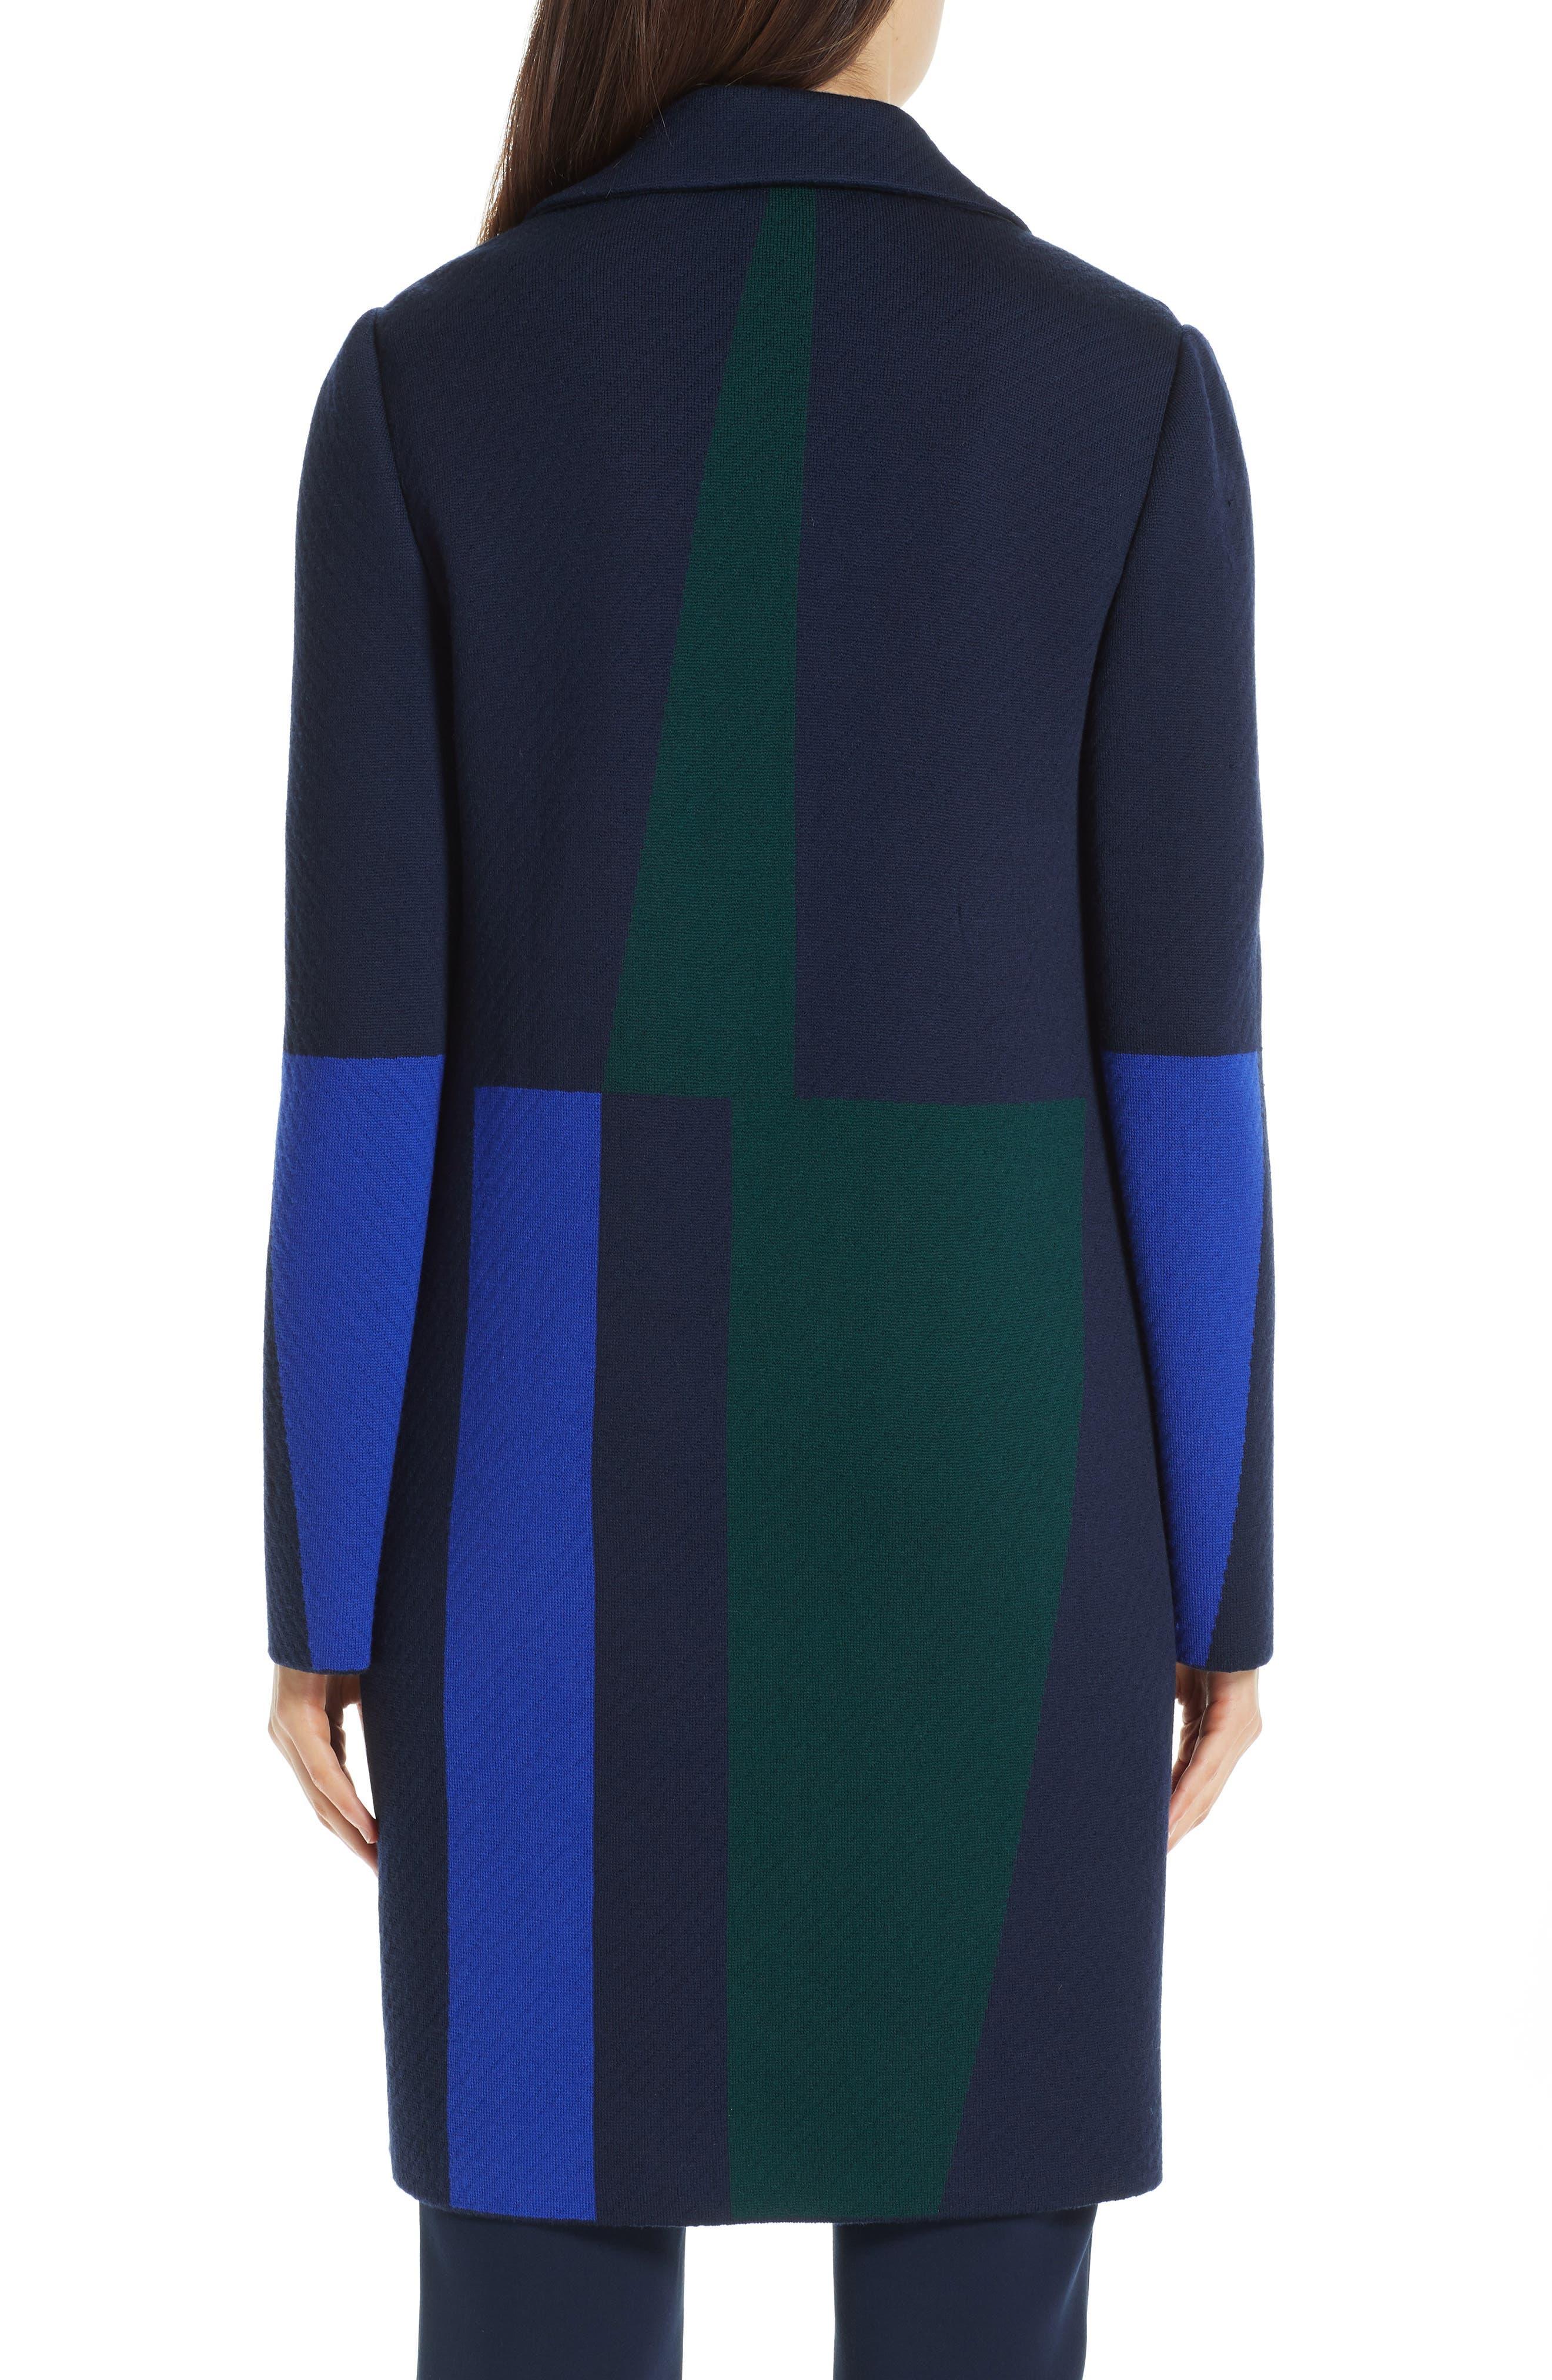 Colorblock Intarsia Wool Twill Jacket,                             Alternate thumbnail 2, color,                             NAVY MULTI